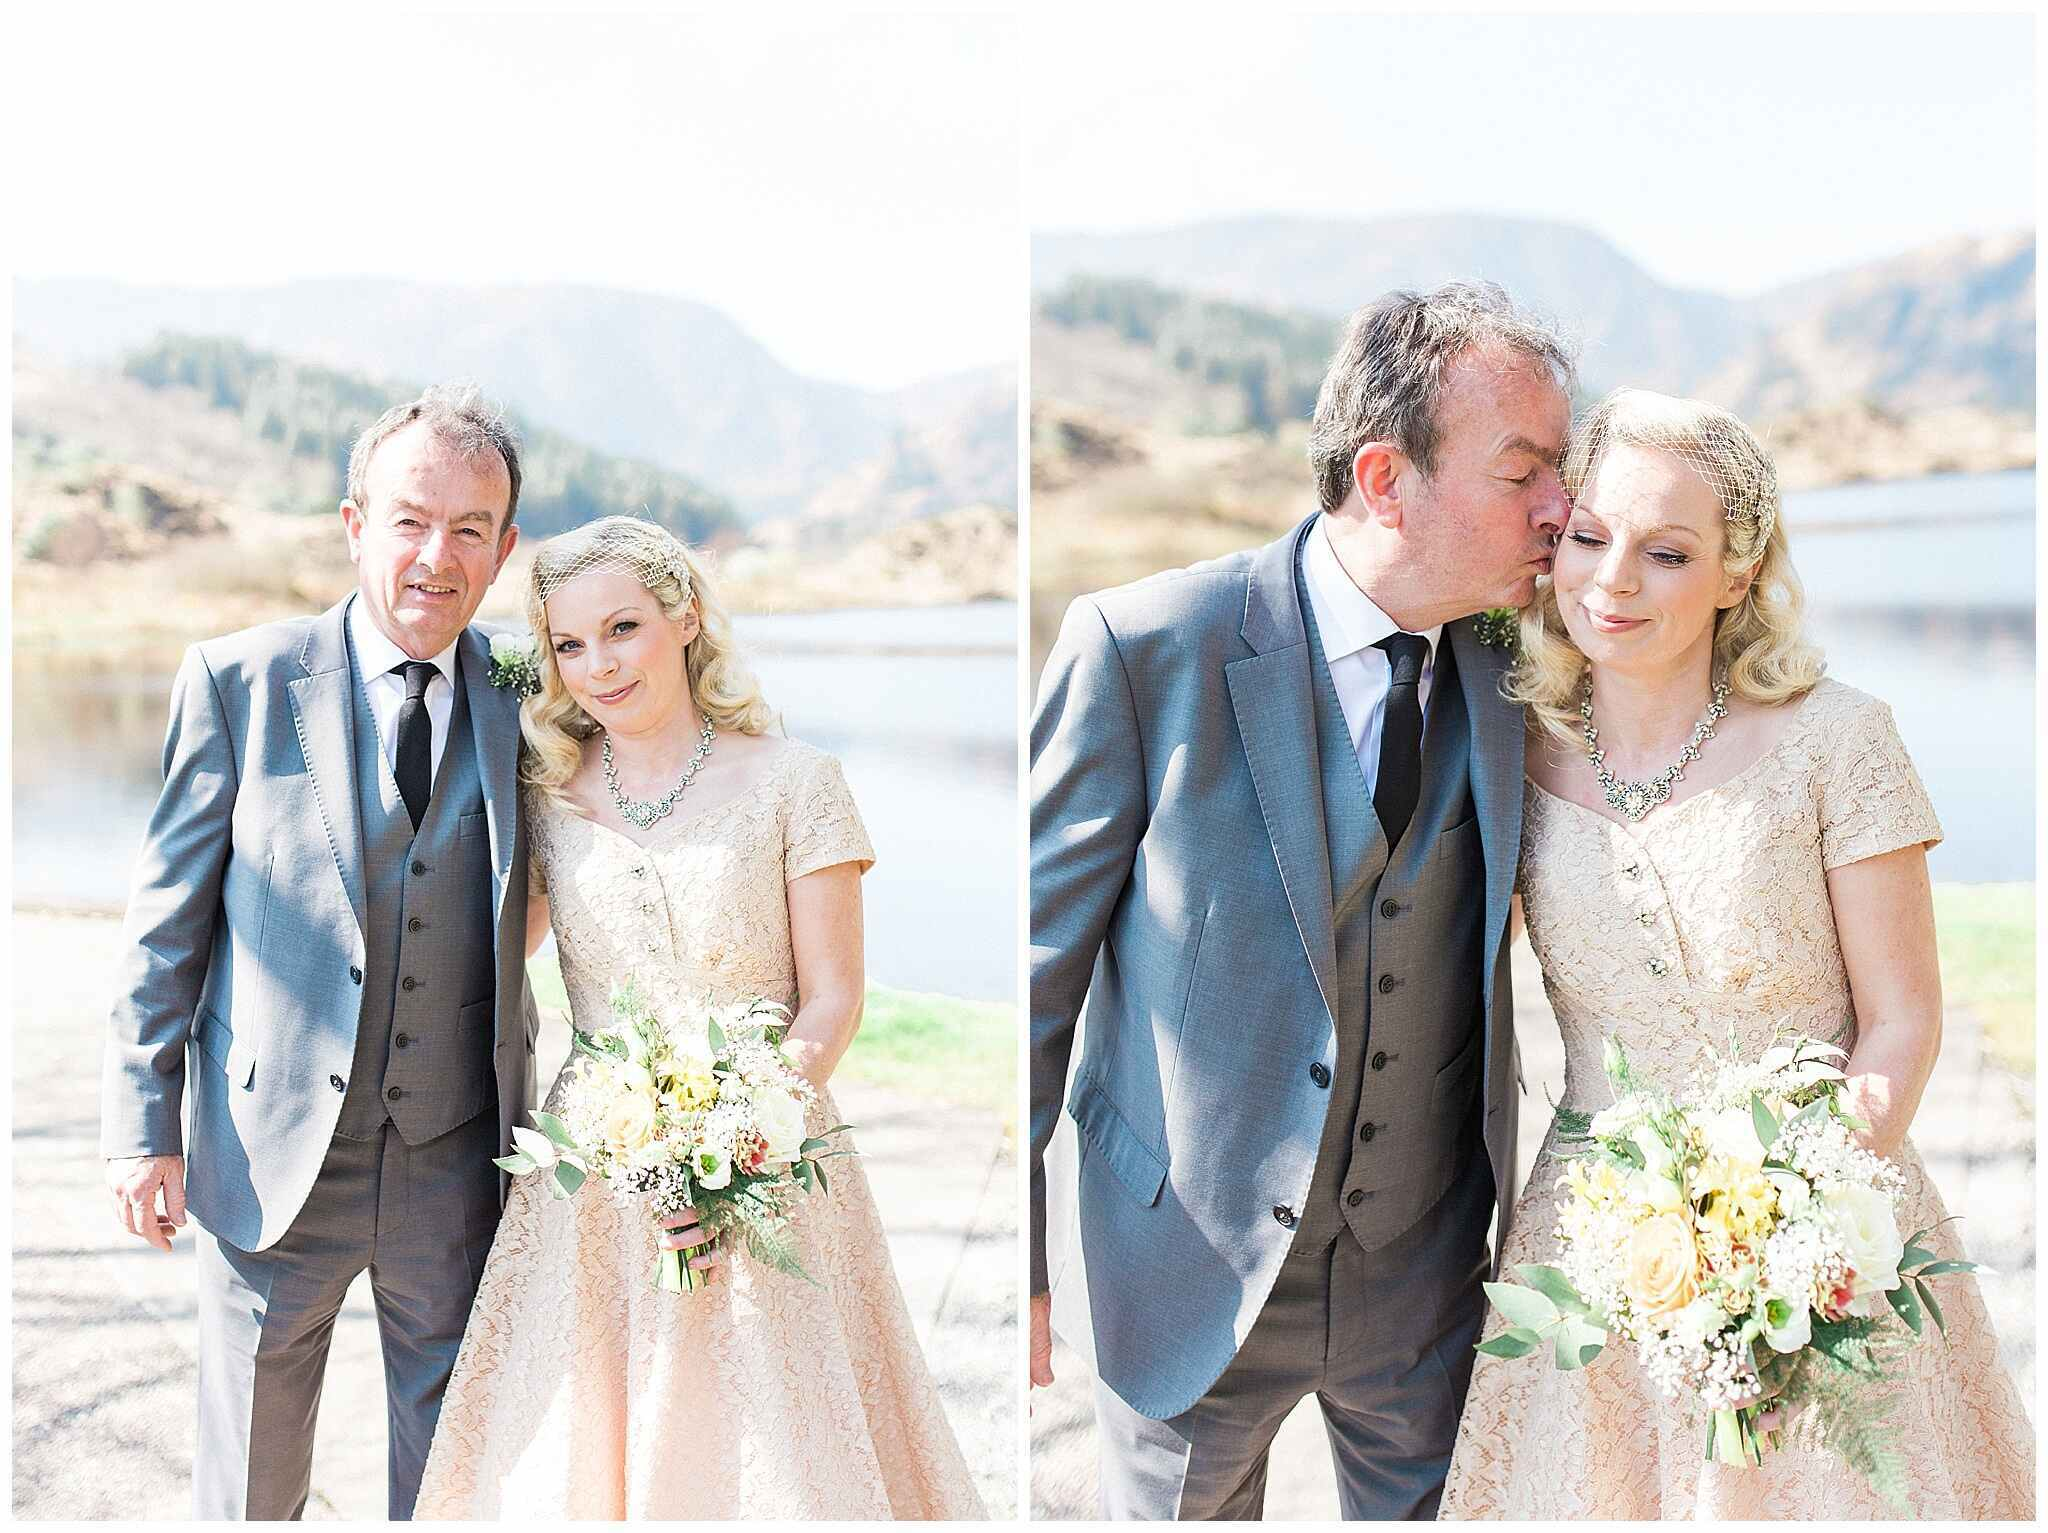 Deirdre + James wedding in Gougane Barra 12